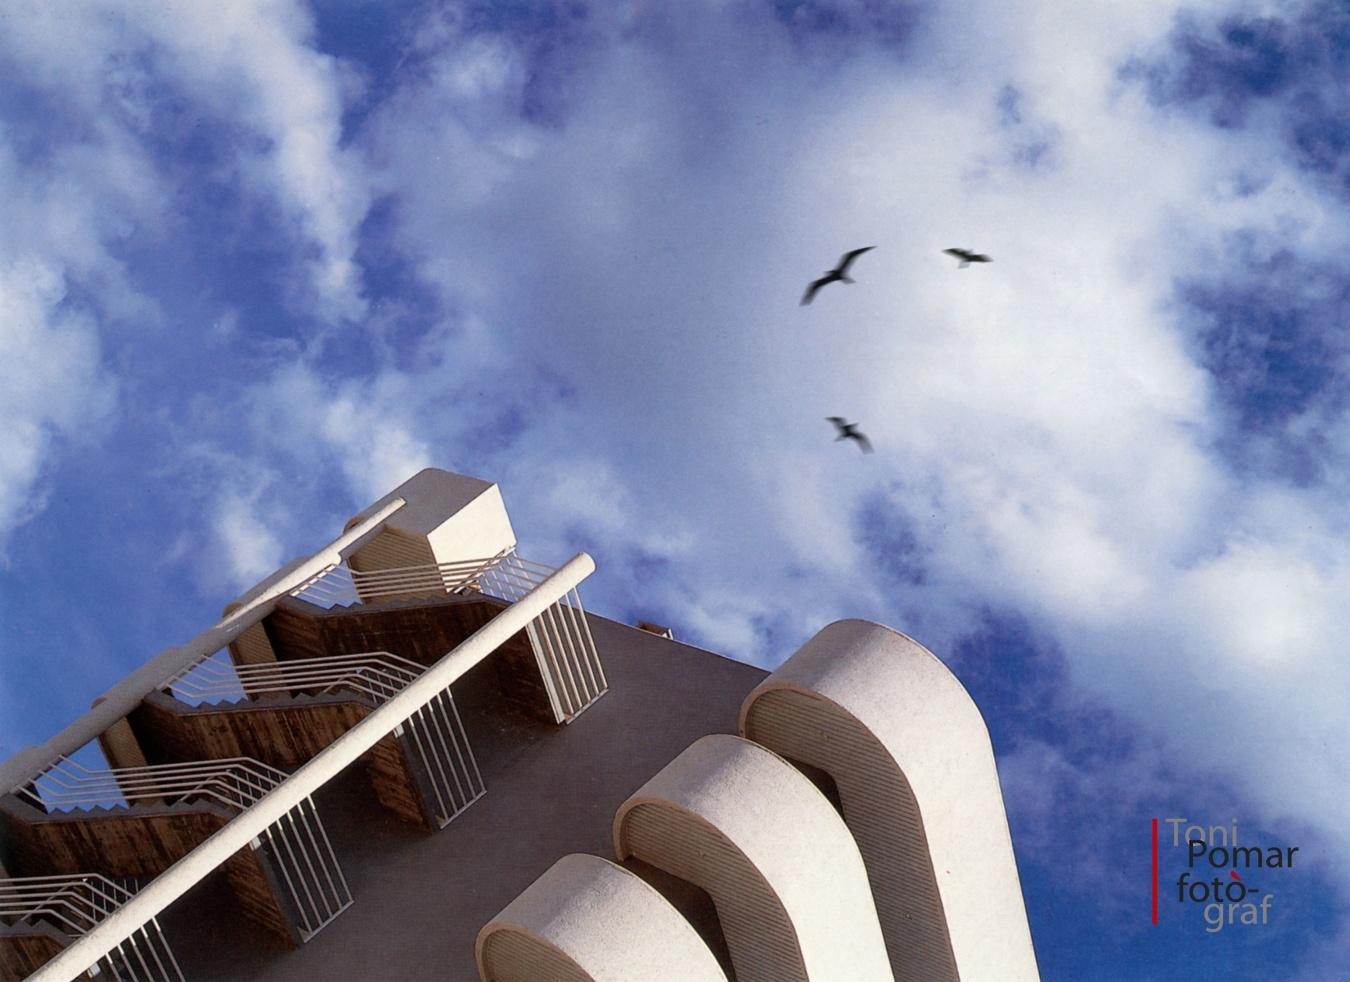 Volar de coloms i gavines per un camí planer - Eivissa as New York - Eivissa as New York